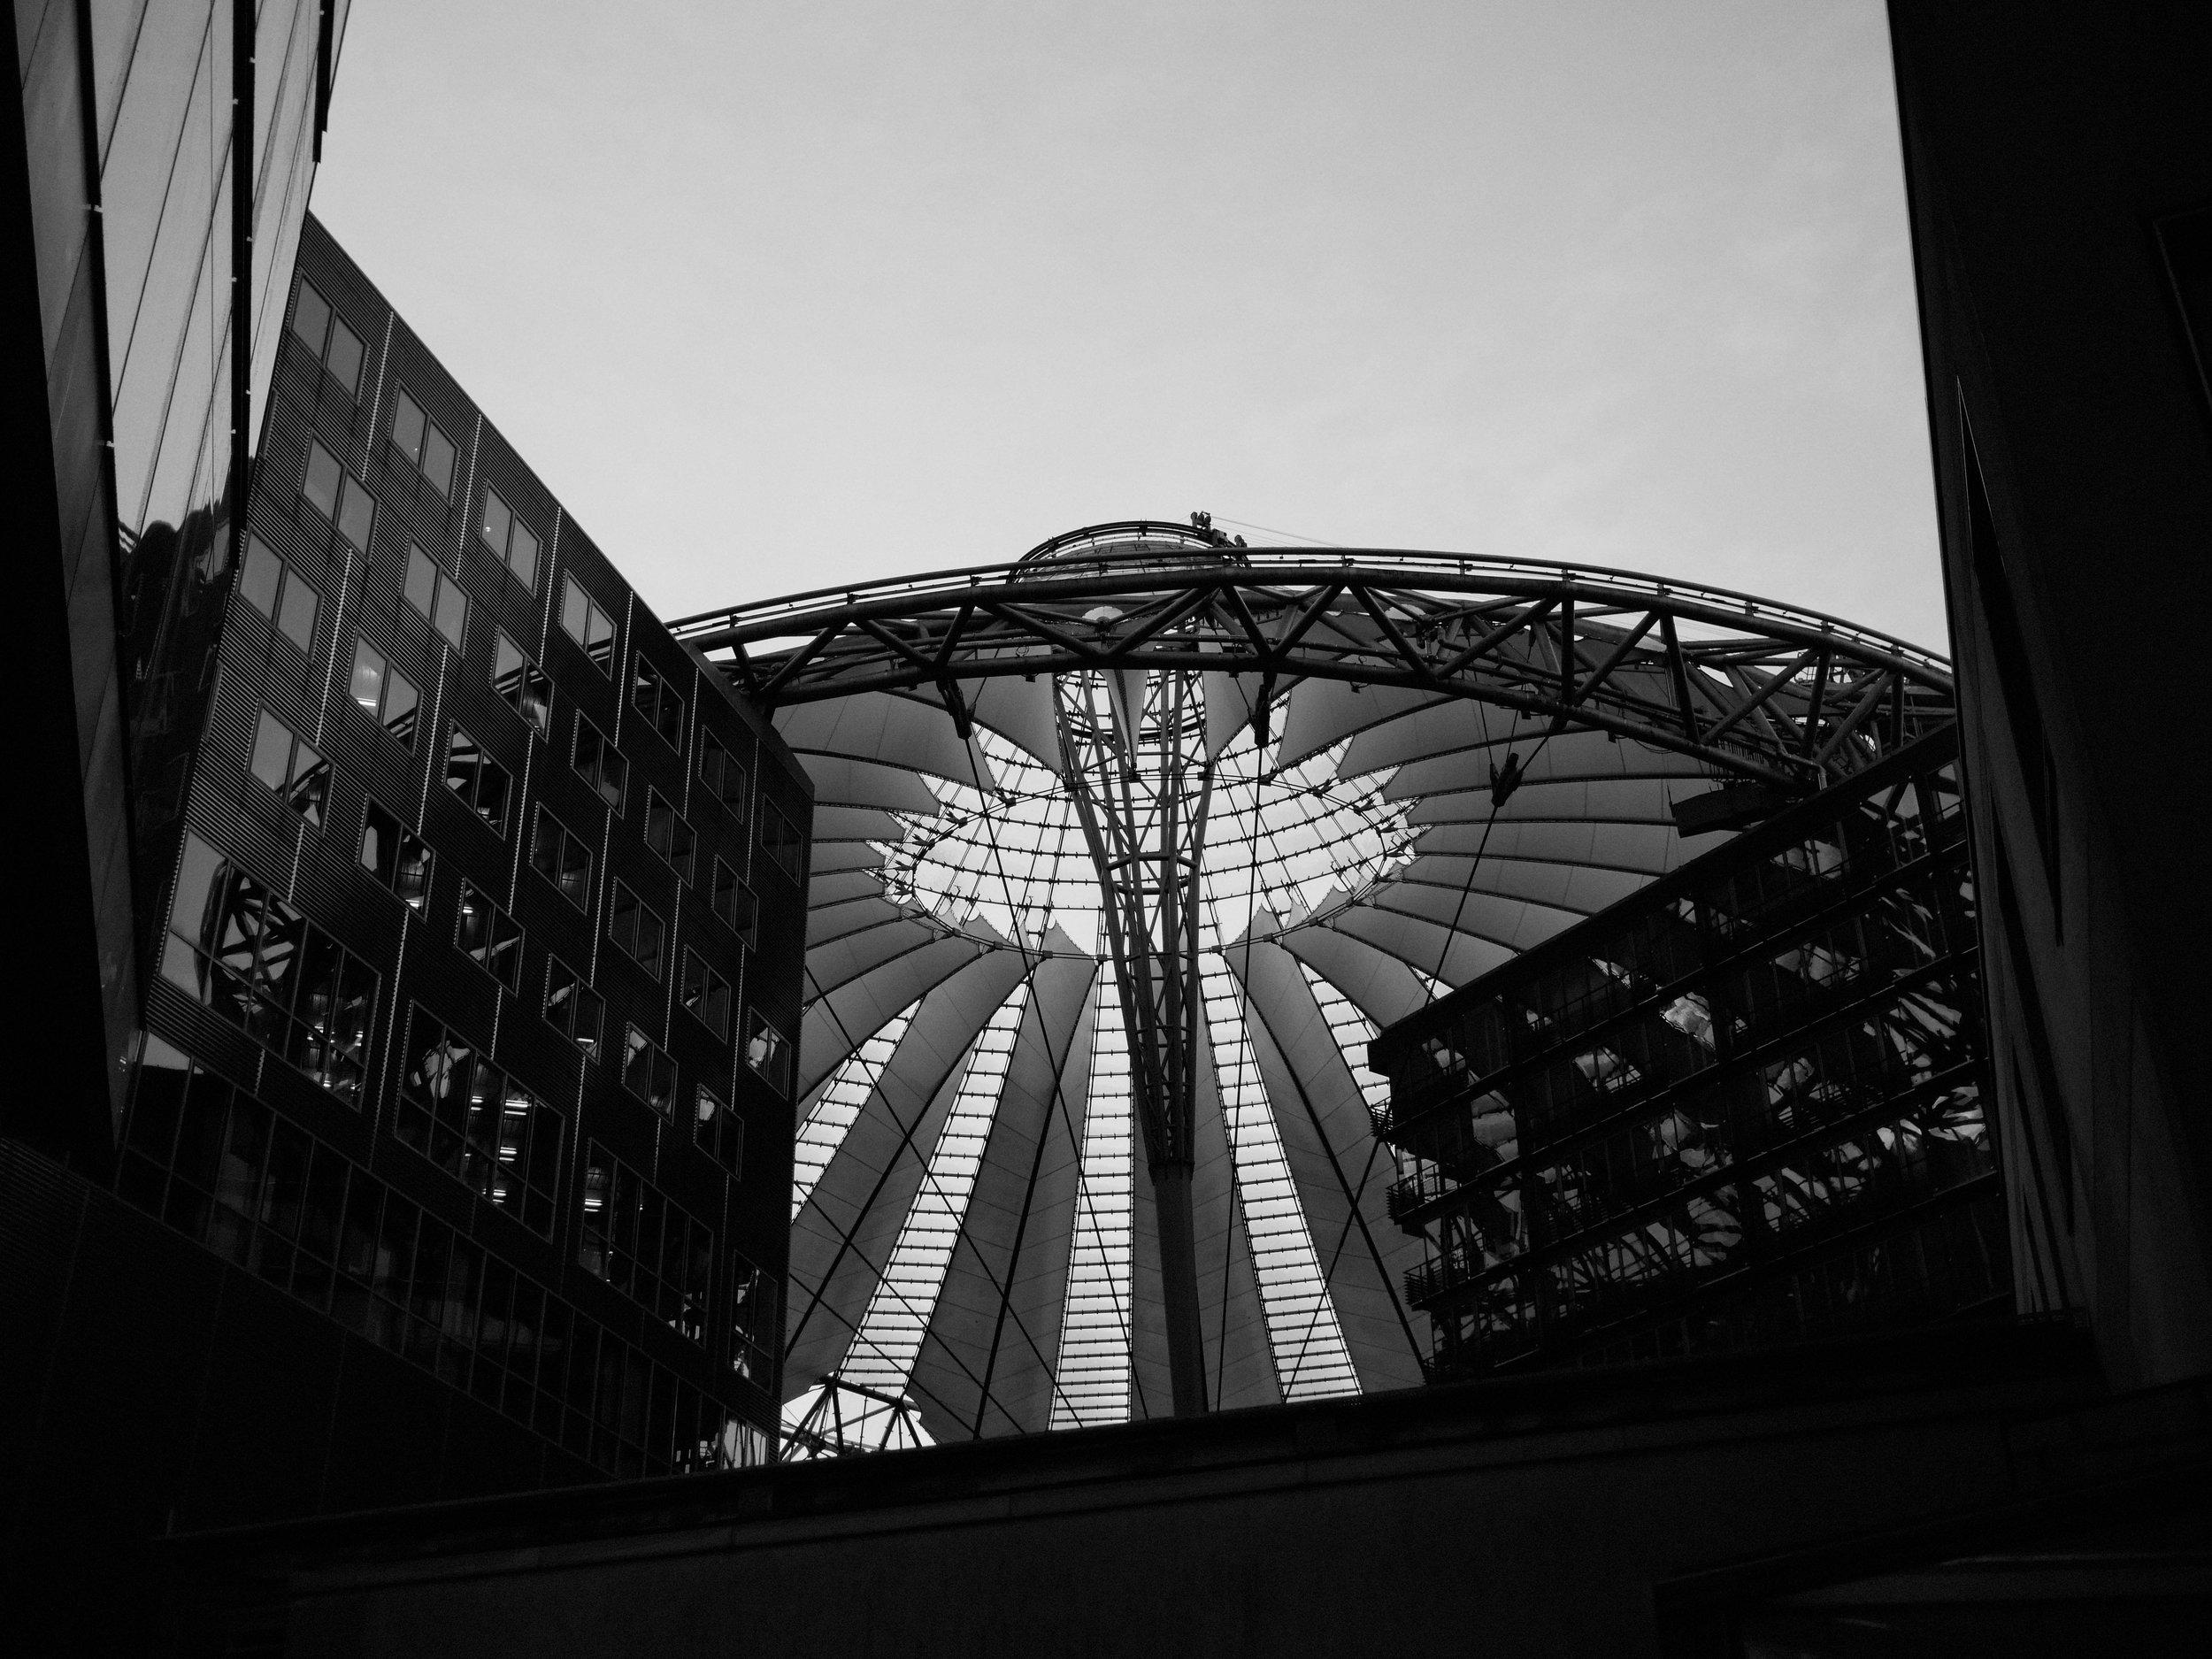 Berlin Sony Center Fotograf Daniel Hammelstein.jpg